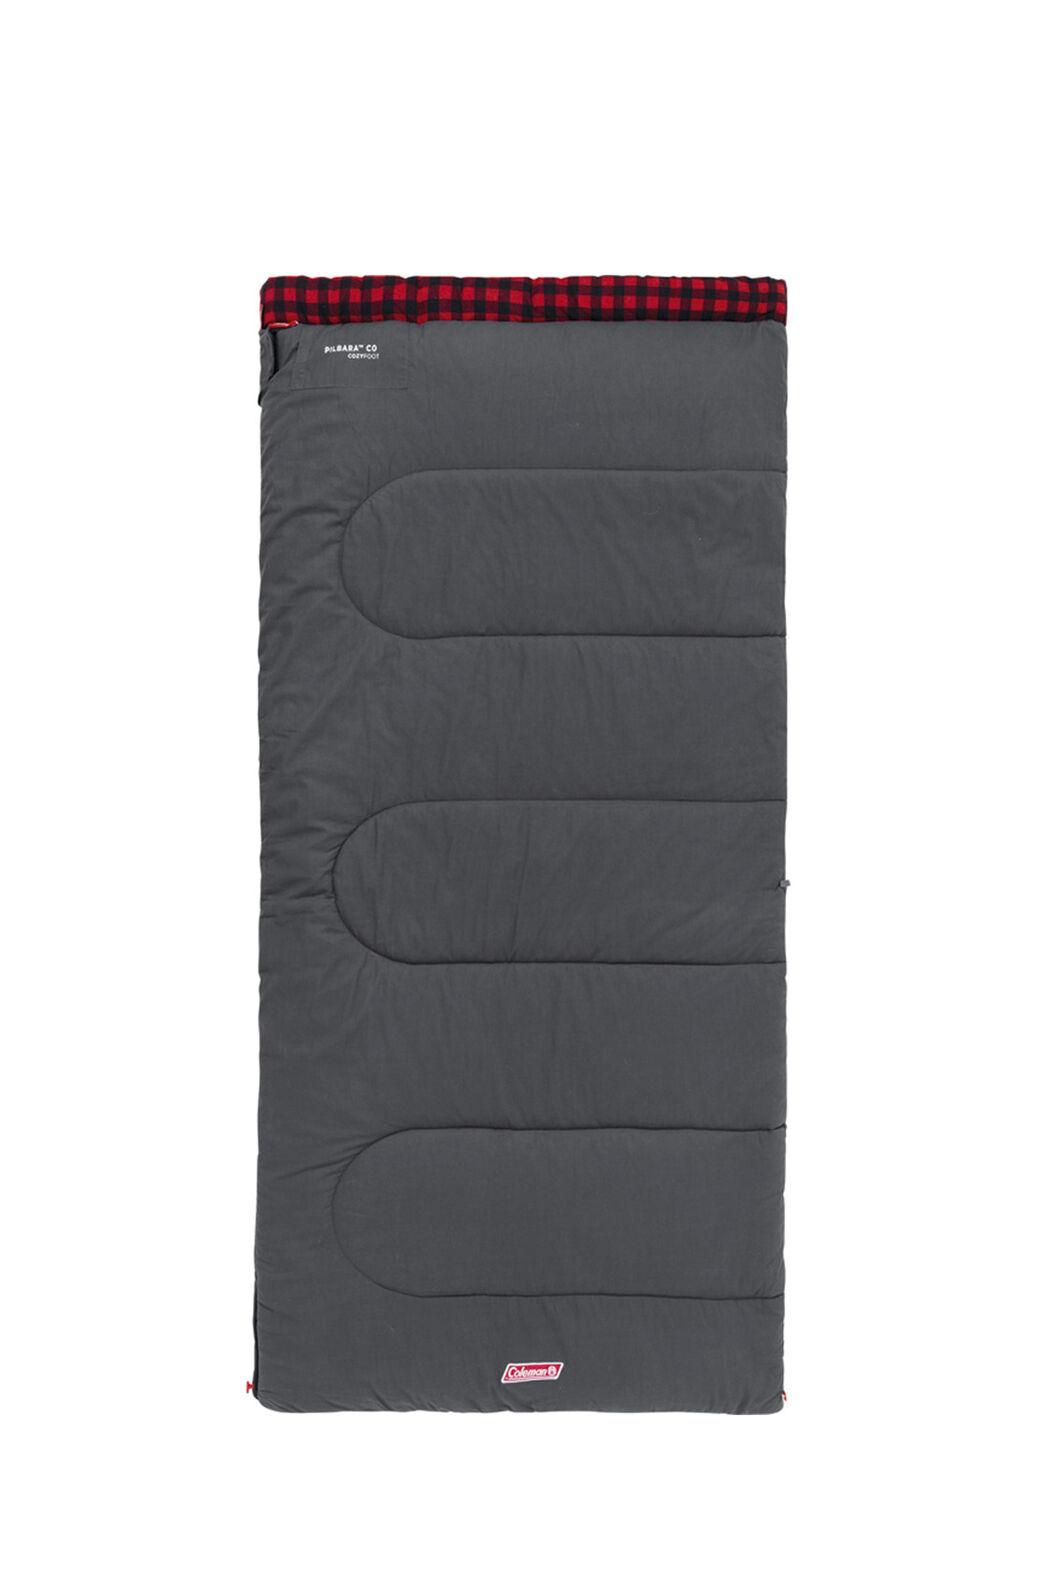 Coleman Pilbara Tall Sleeping Bag 0, None, hi-res